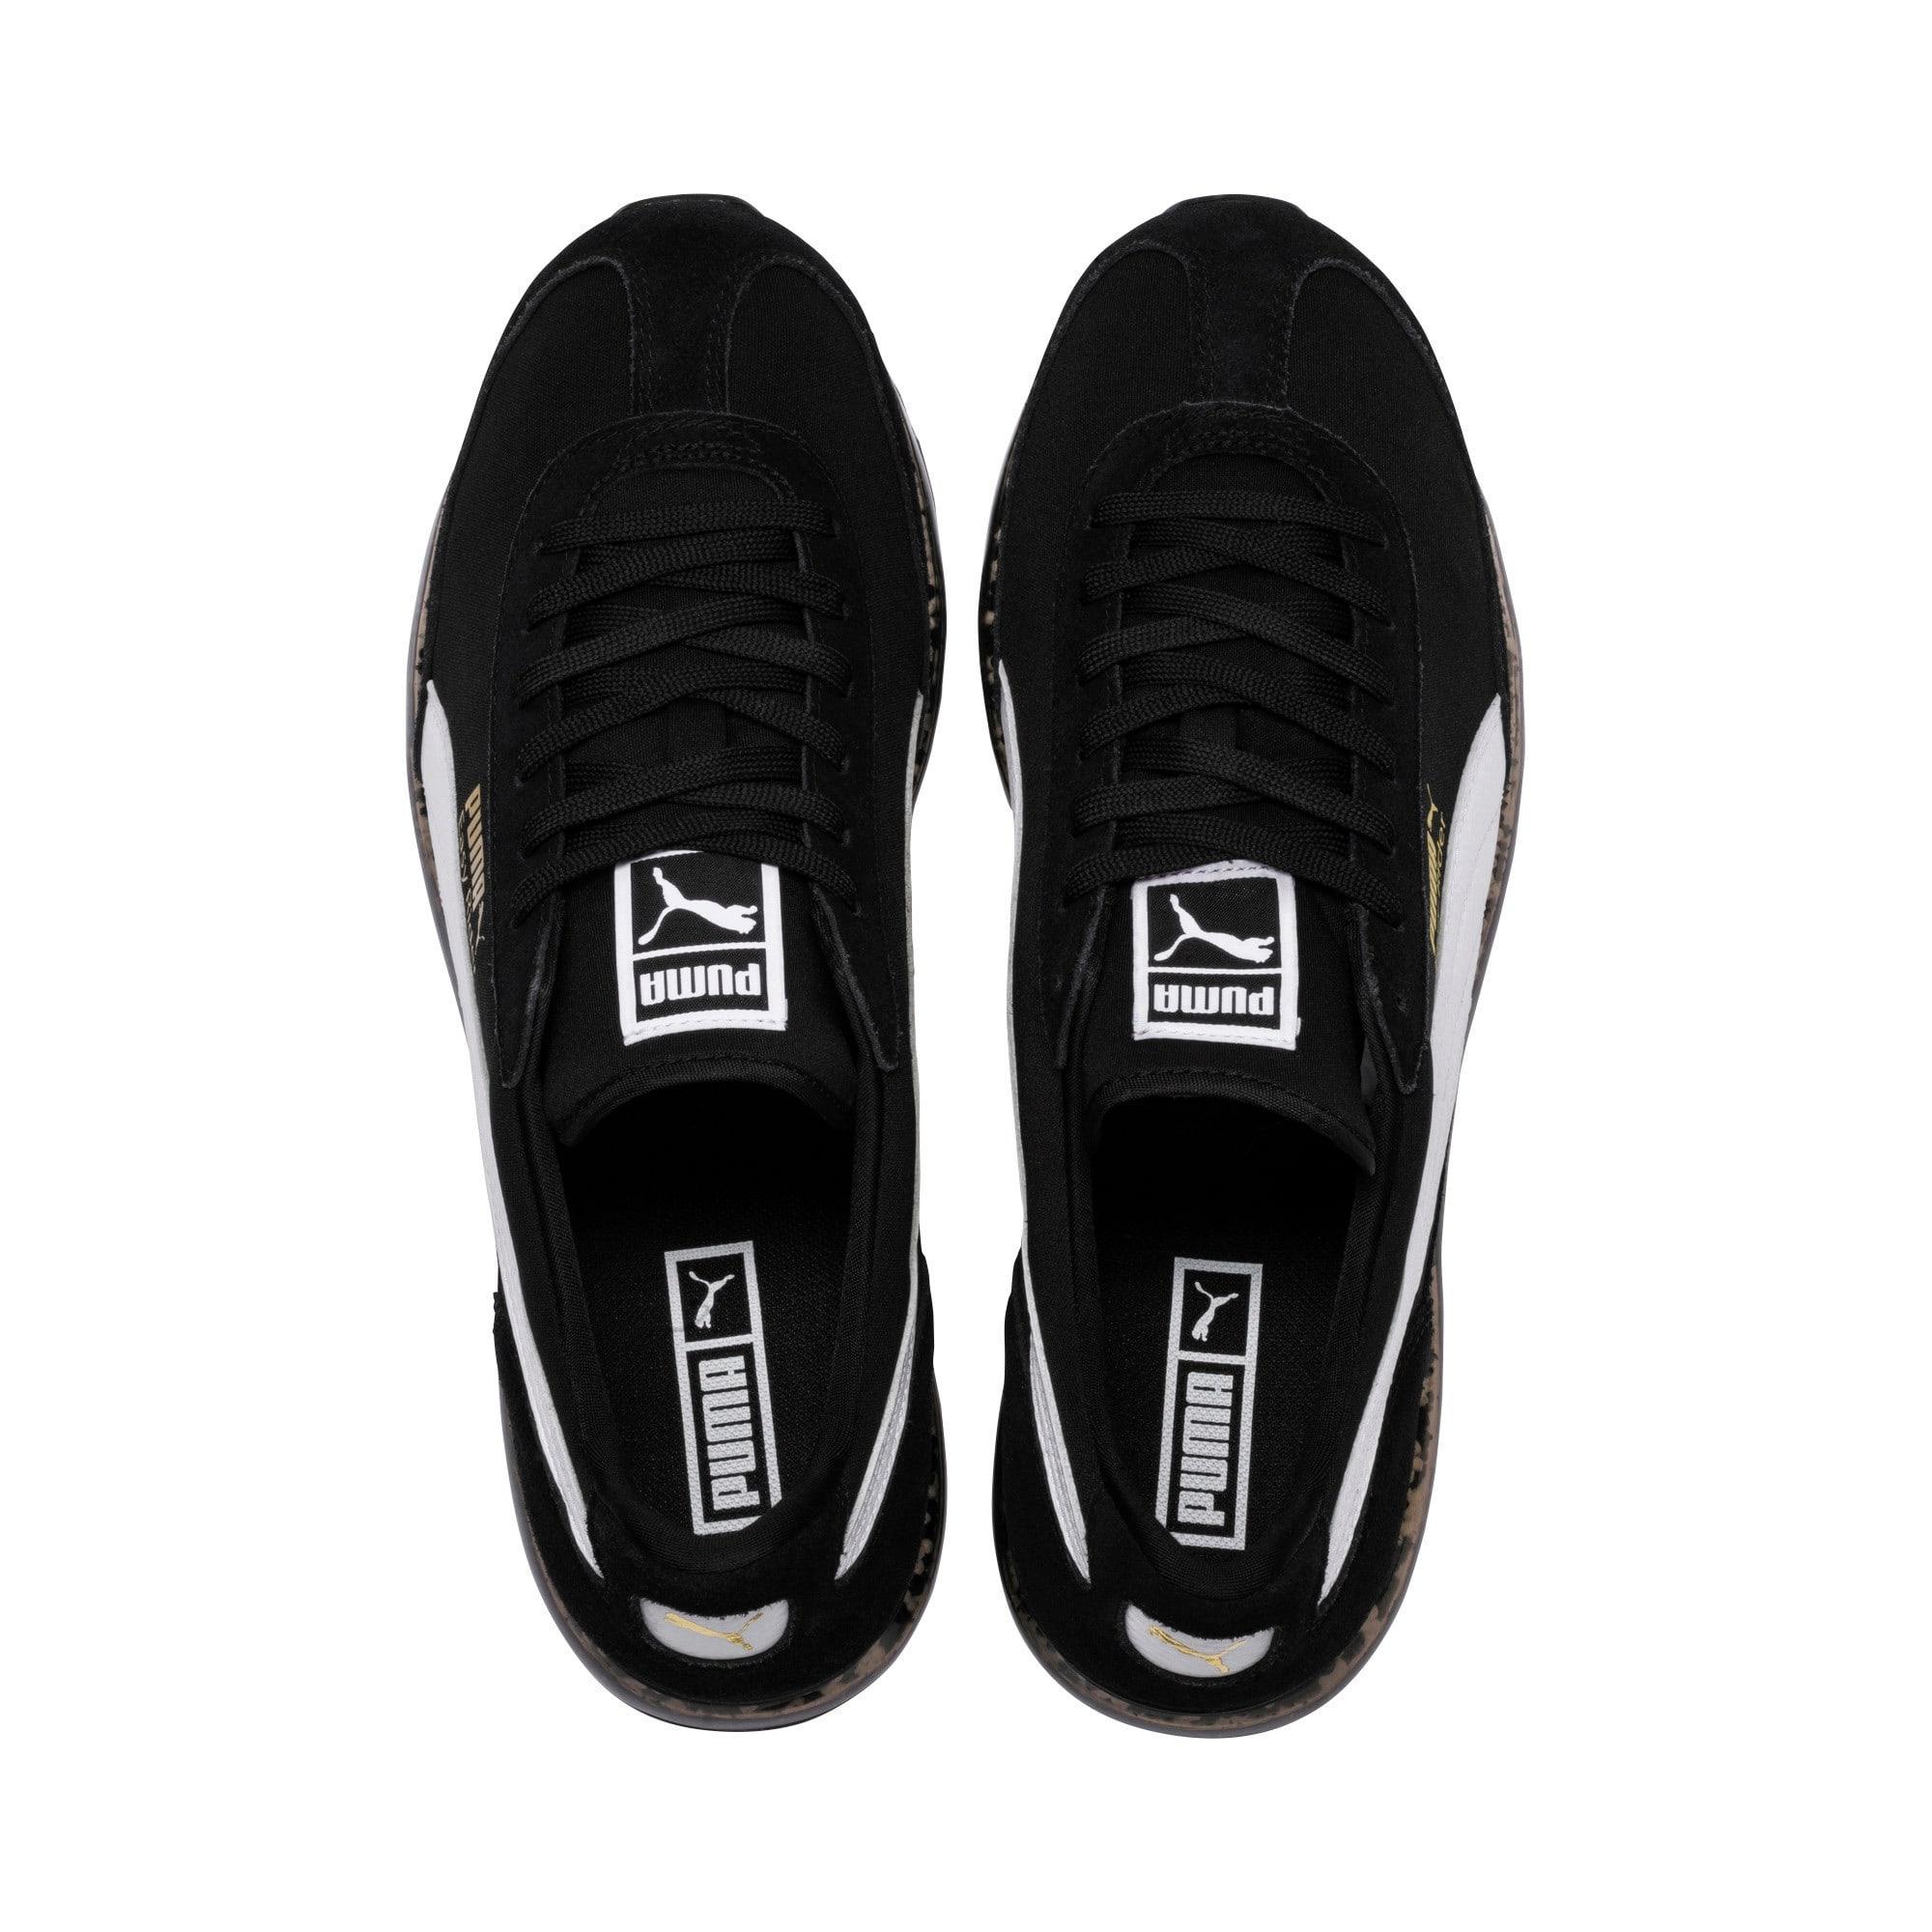 Thumbnail 6 of Jamming Easy Rider Running Shoes, Puma Black-Puma White, medium